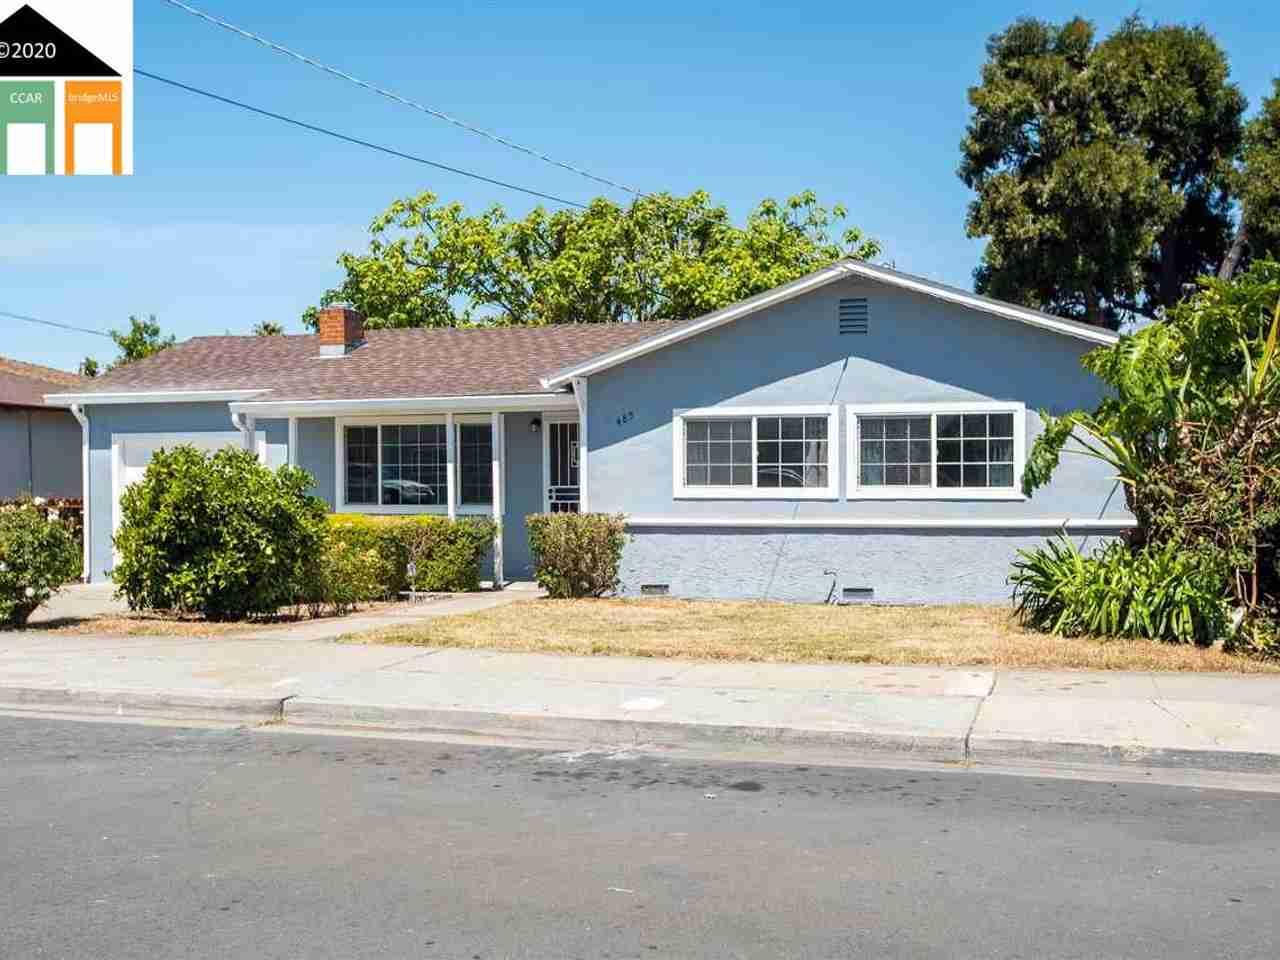 485 PAMELA CT Hayward, CA, 94541